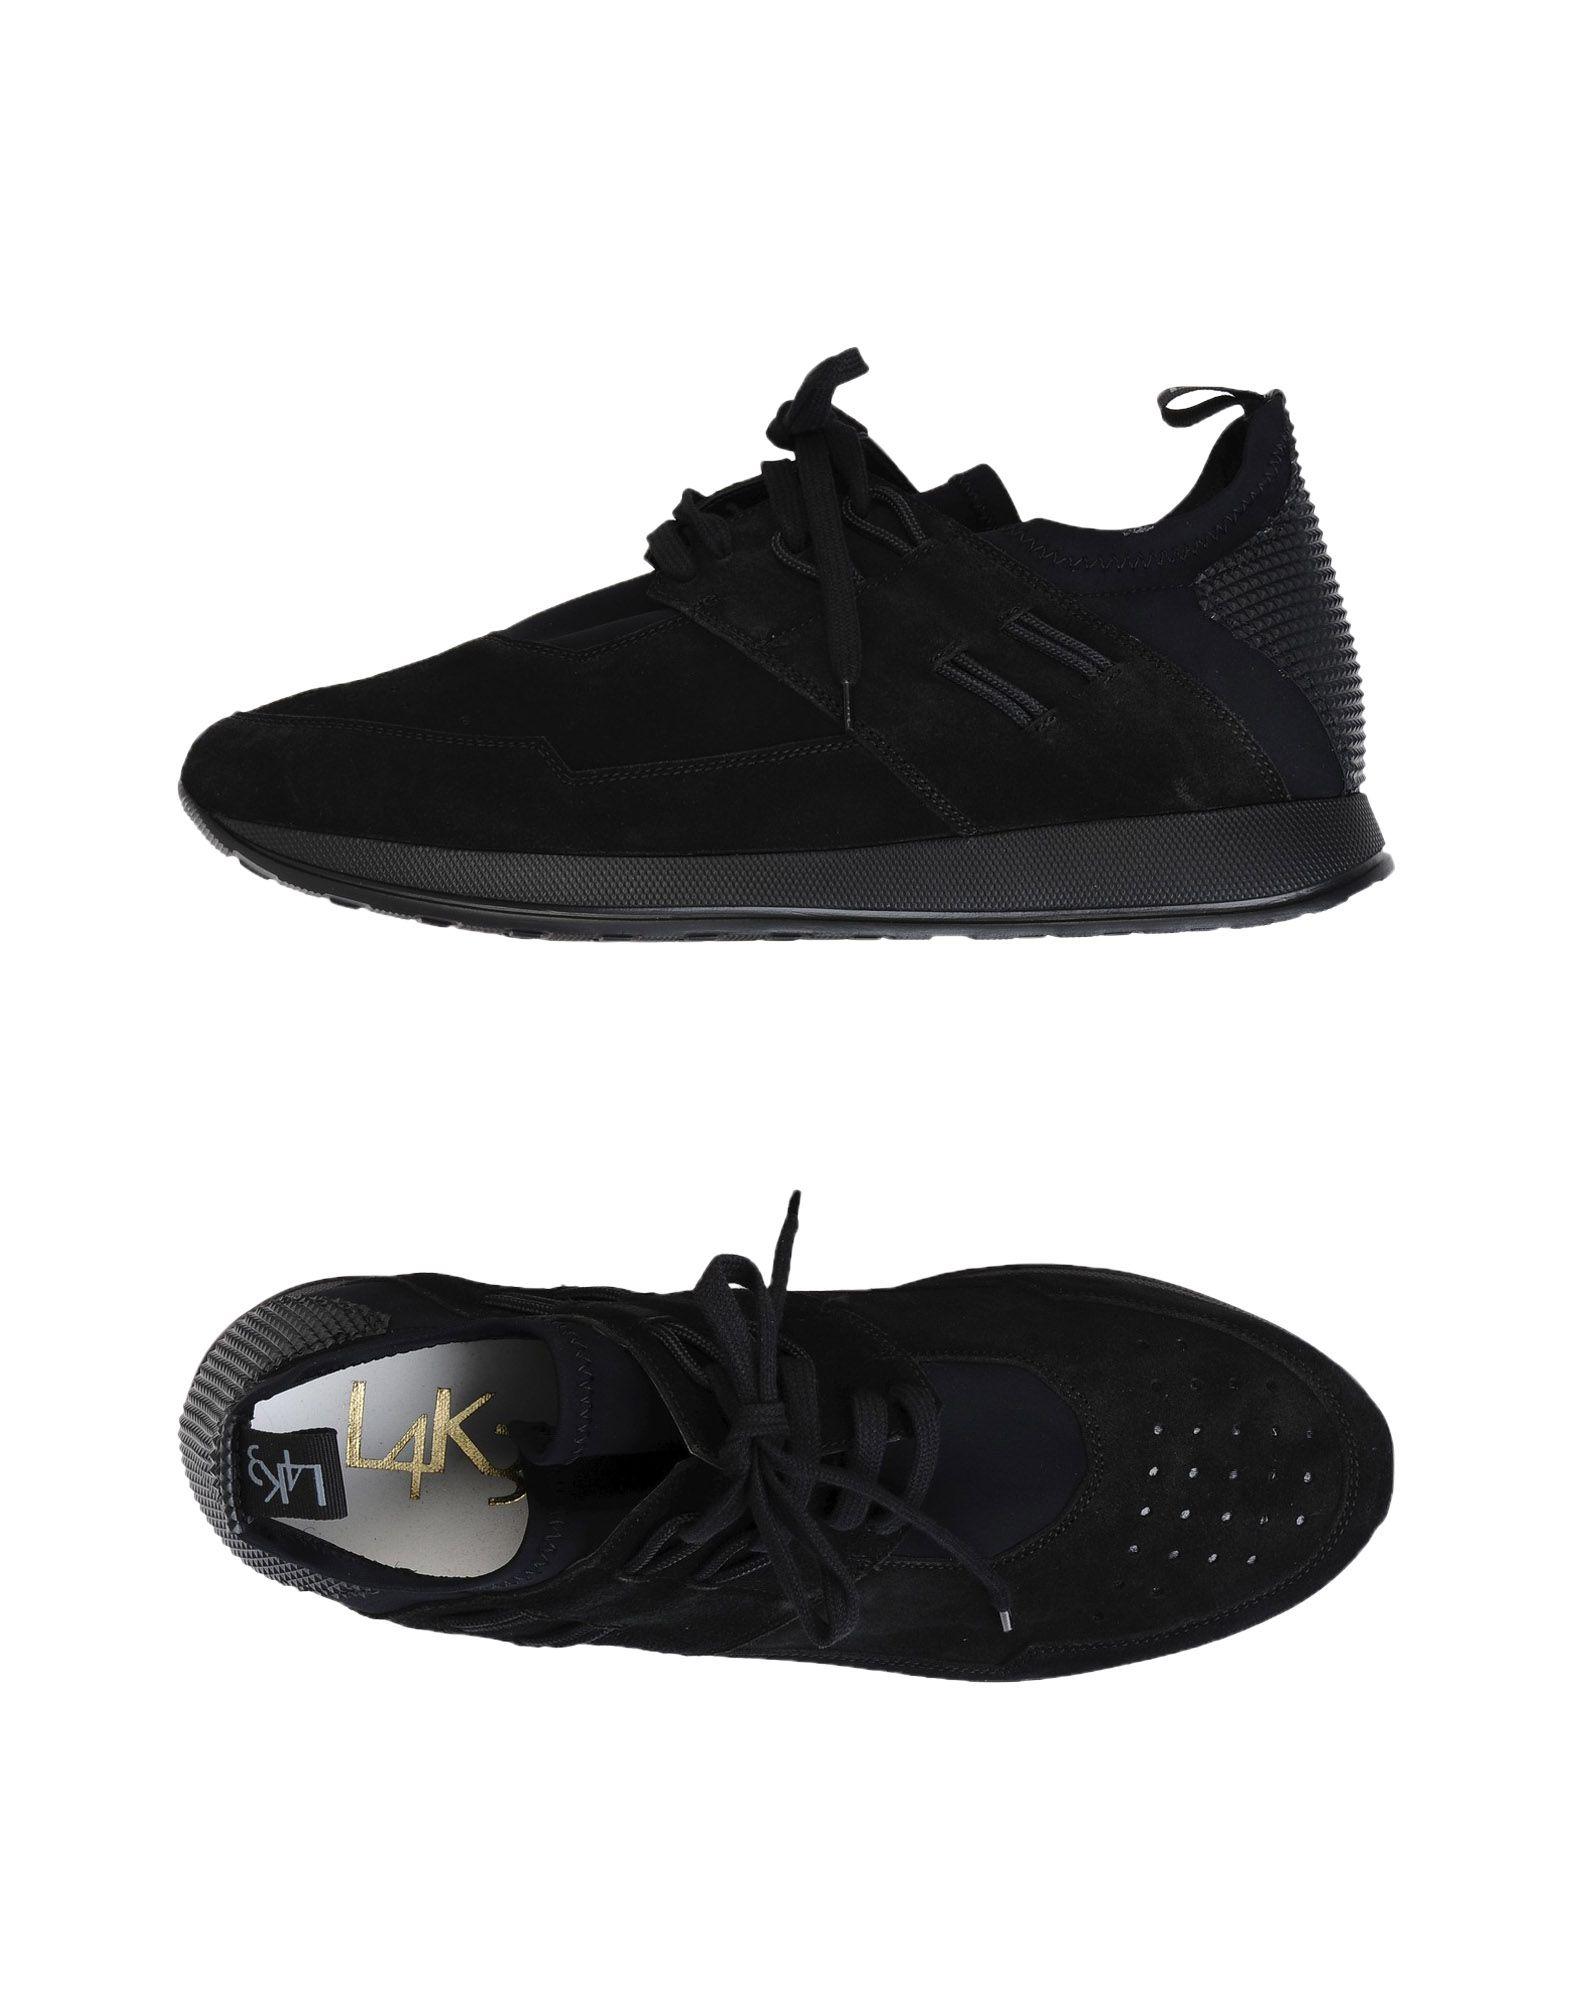 Sneakers L4k3 Torpedo - Uomo - Acquista online su